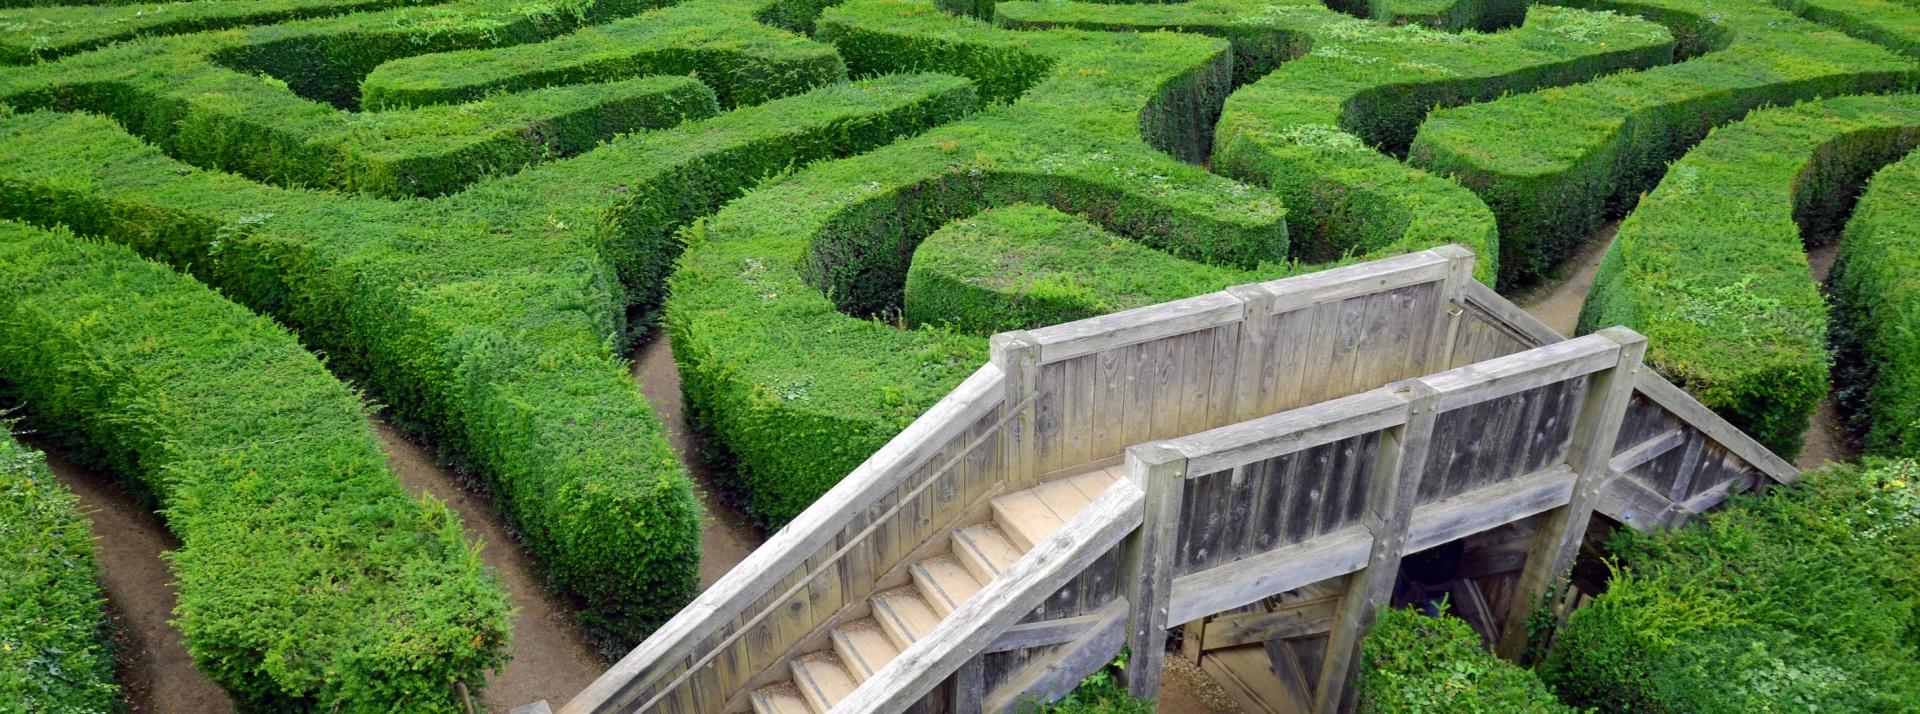 Wir helfen im Labyrinth . . .